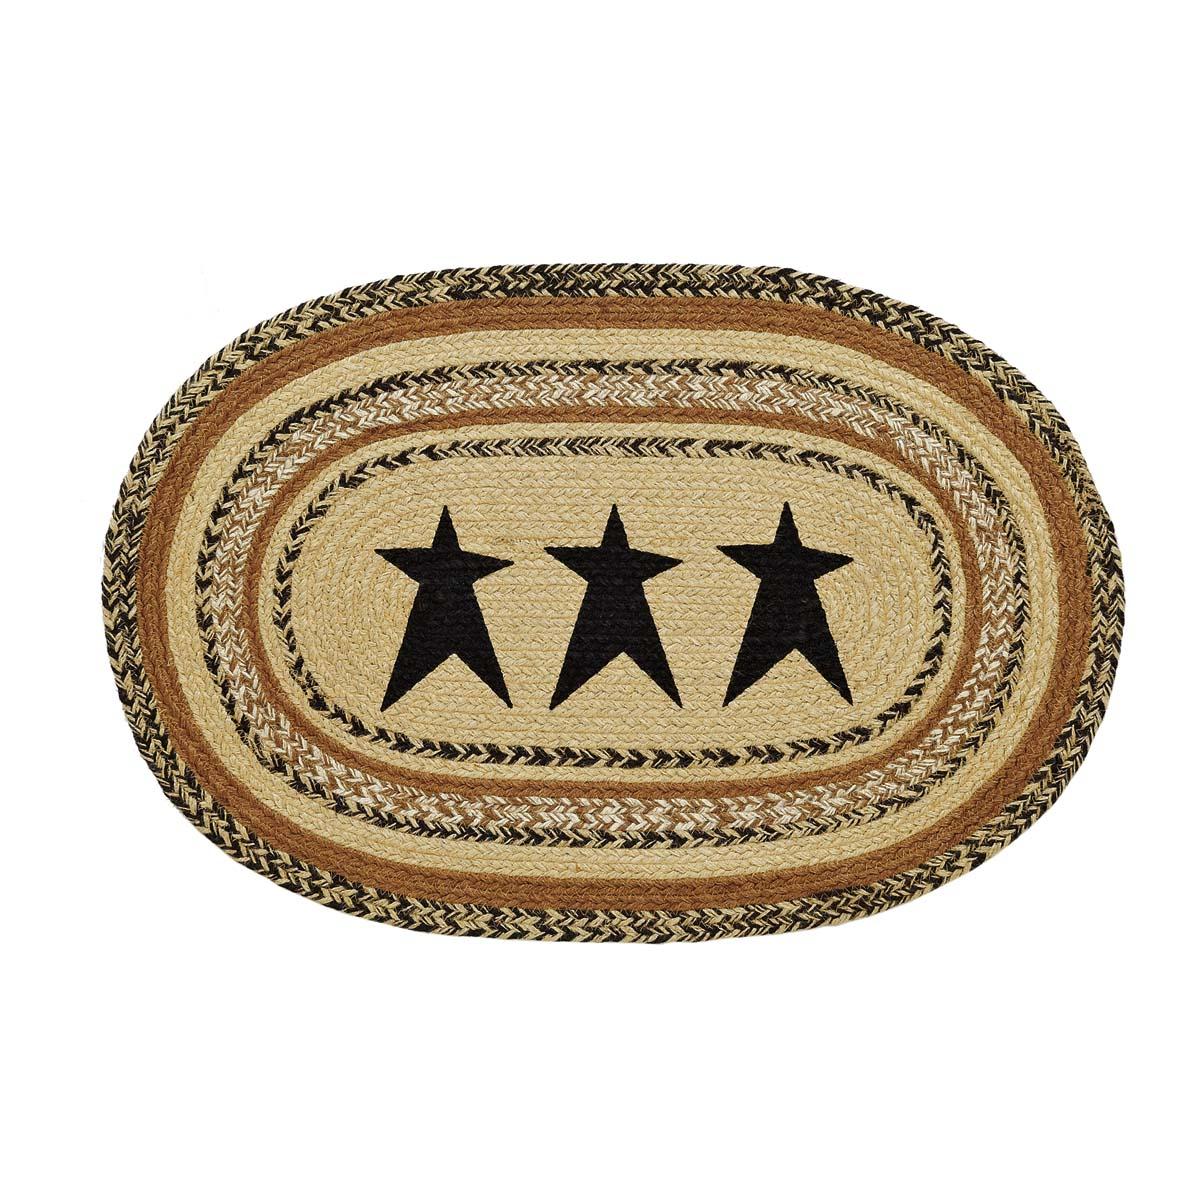 Kettle Grove Jute Rug Oval Stencil Star 20x30